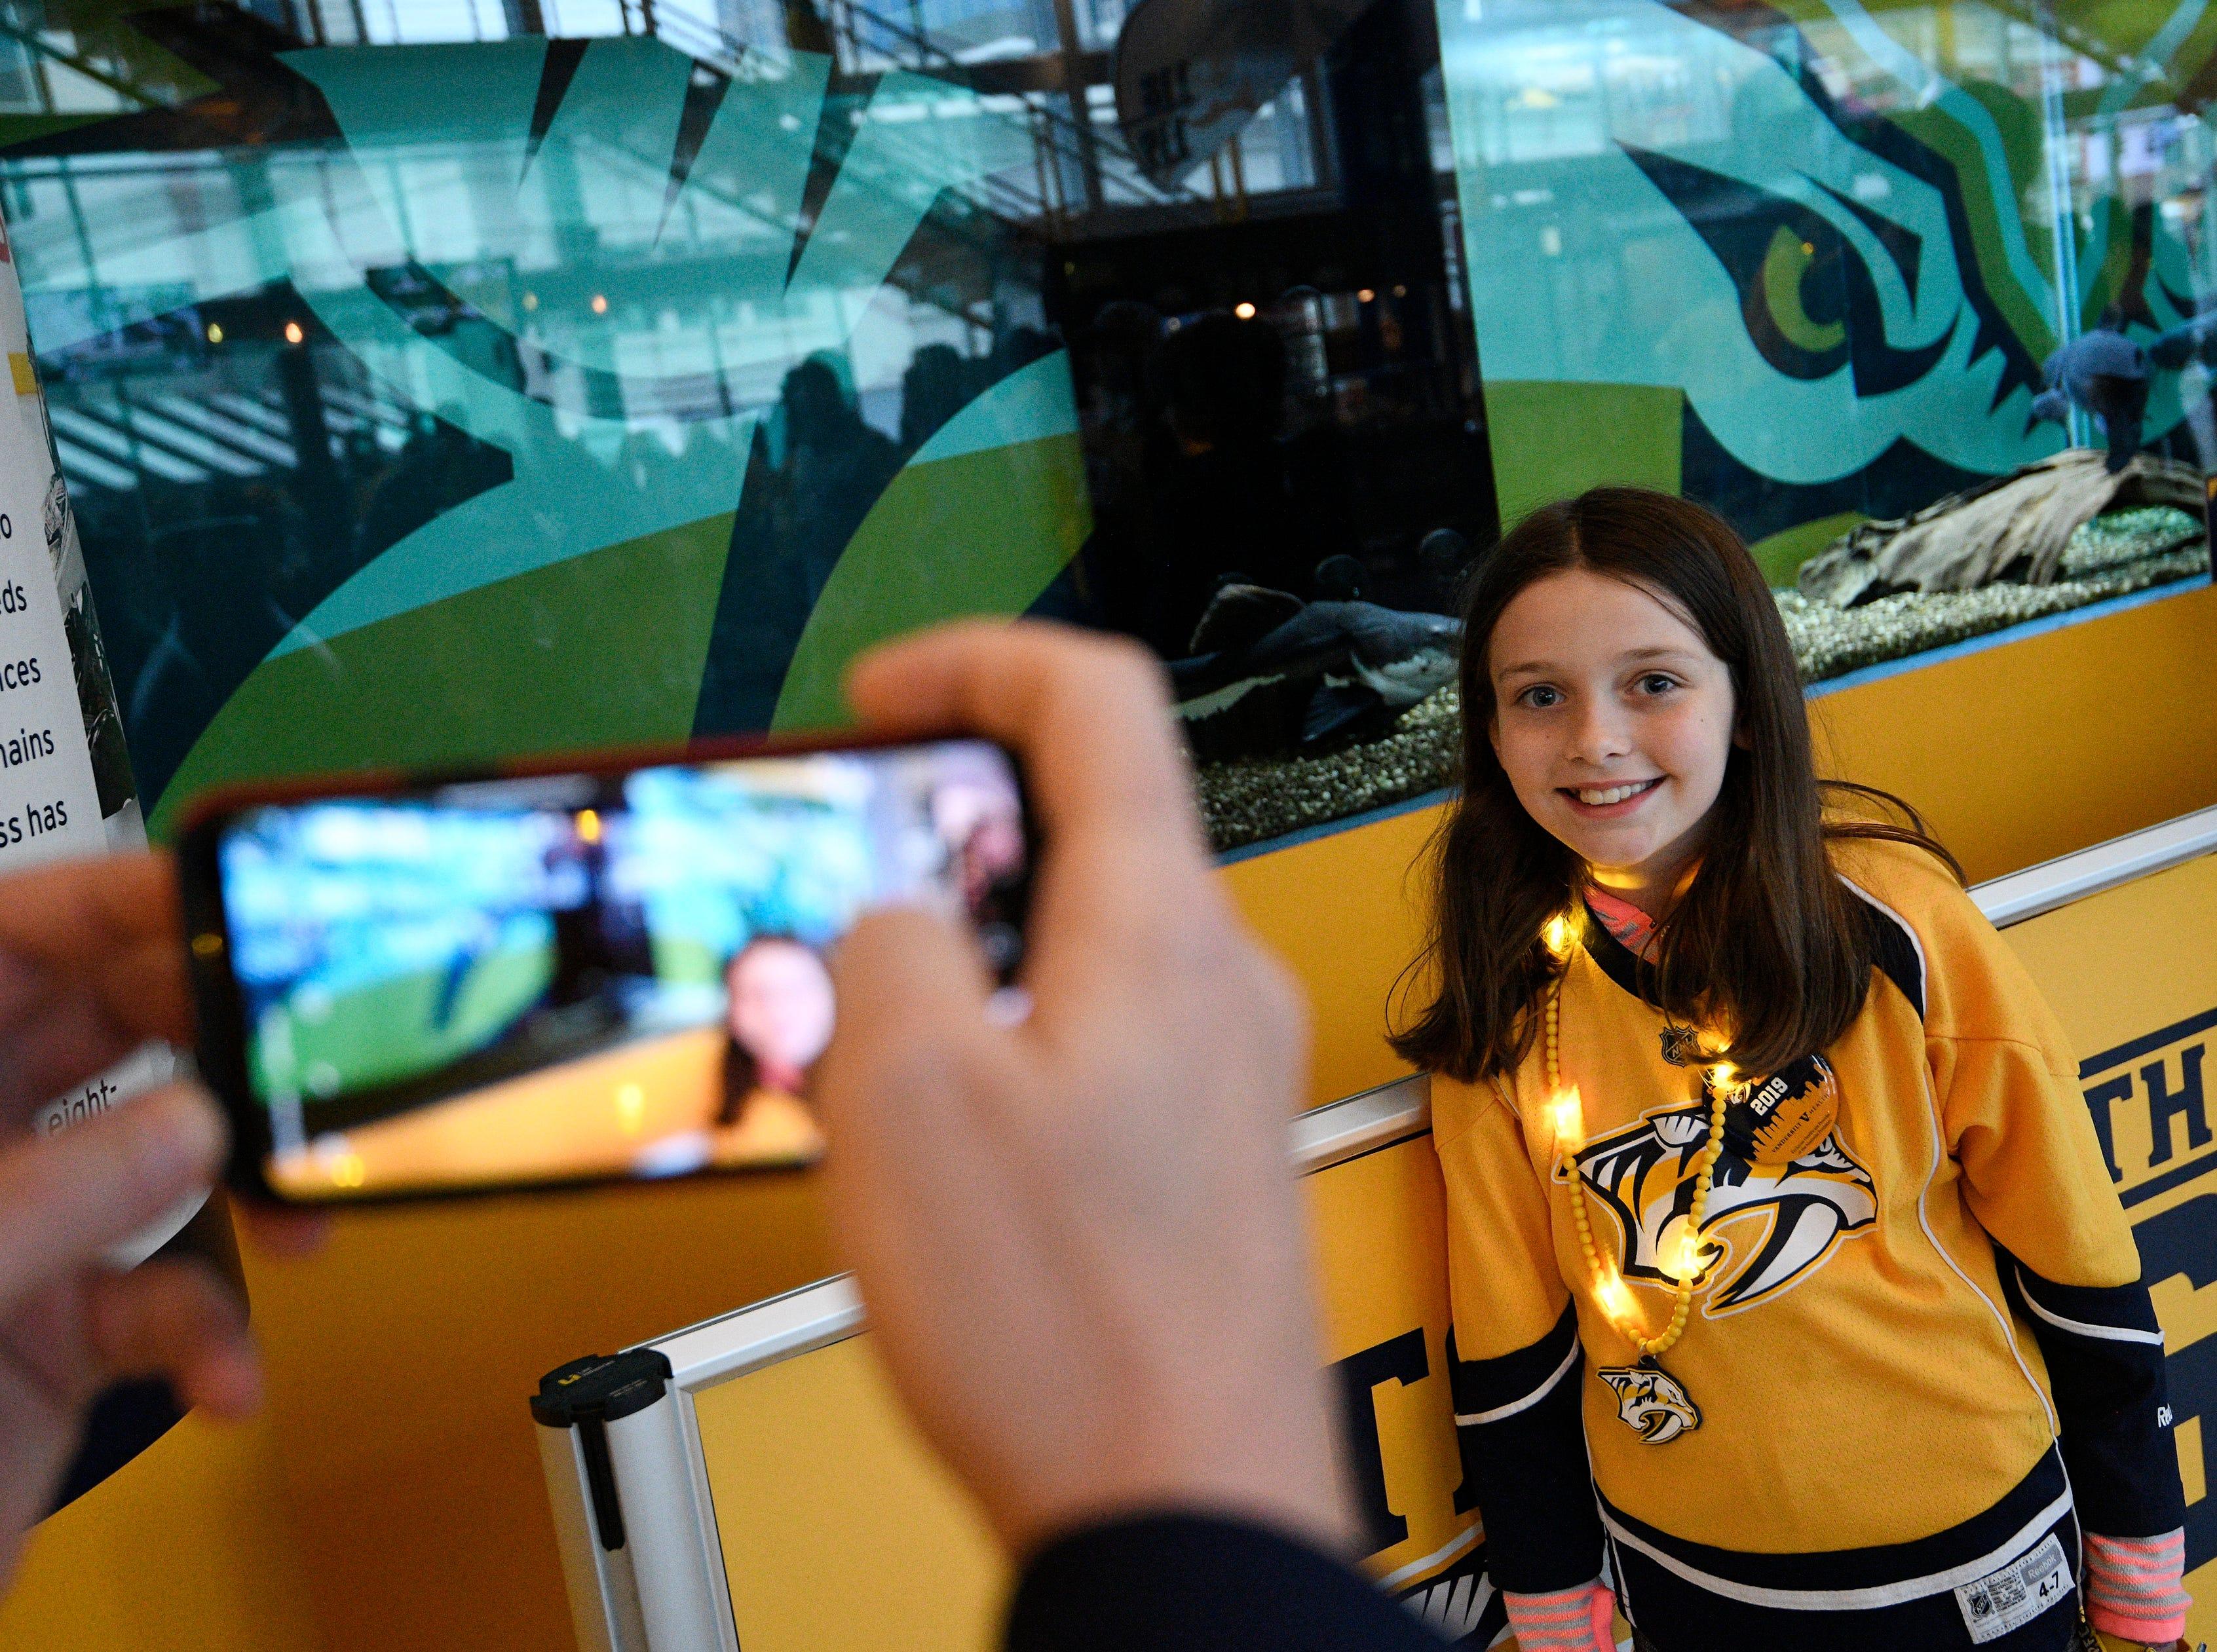 Amelia Scanlan, 9, poses for a photo by the catfish before the Predators' divisional semifinal game against Dallas at Bridgestone Arena in Nashville, Tenn., Saturday, April 13, 2019.